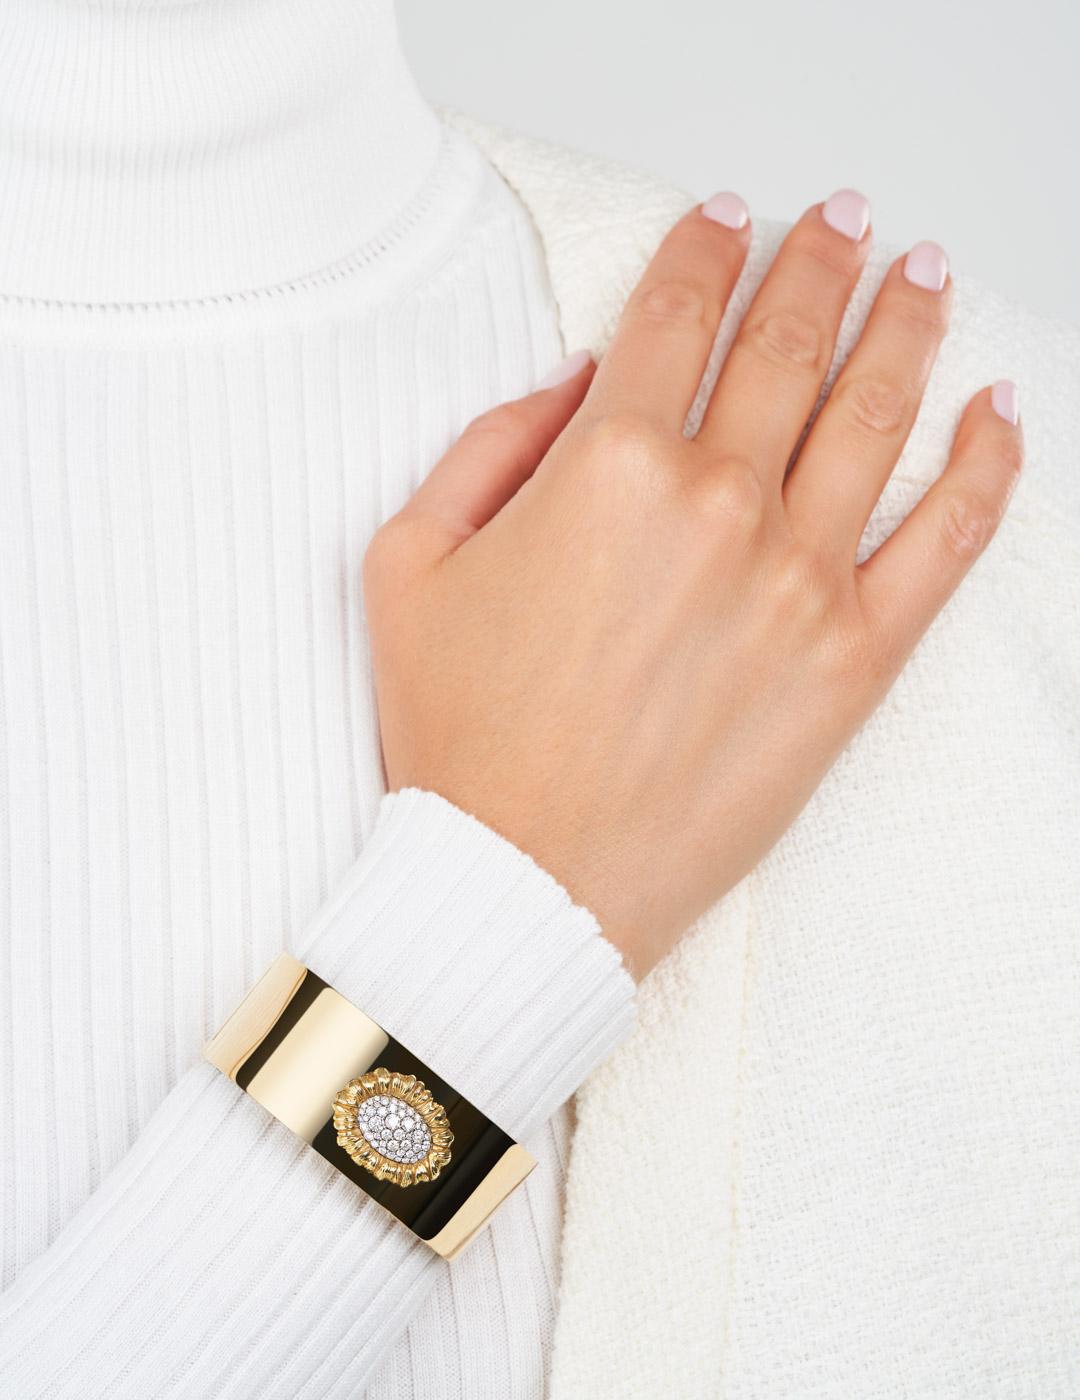 mish_jewelry_product_Nigella-YG-Cuff-4